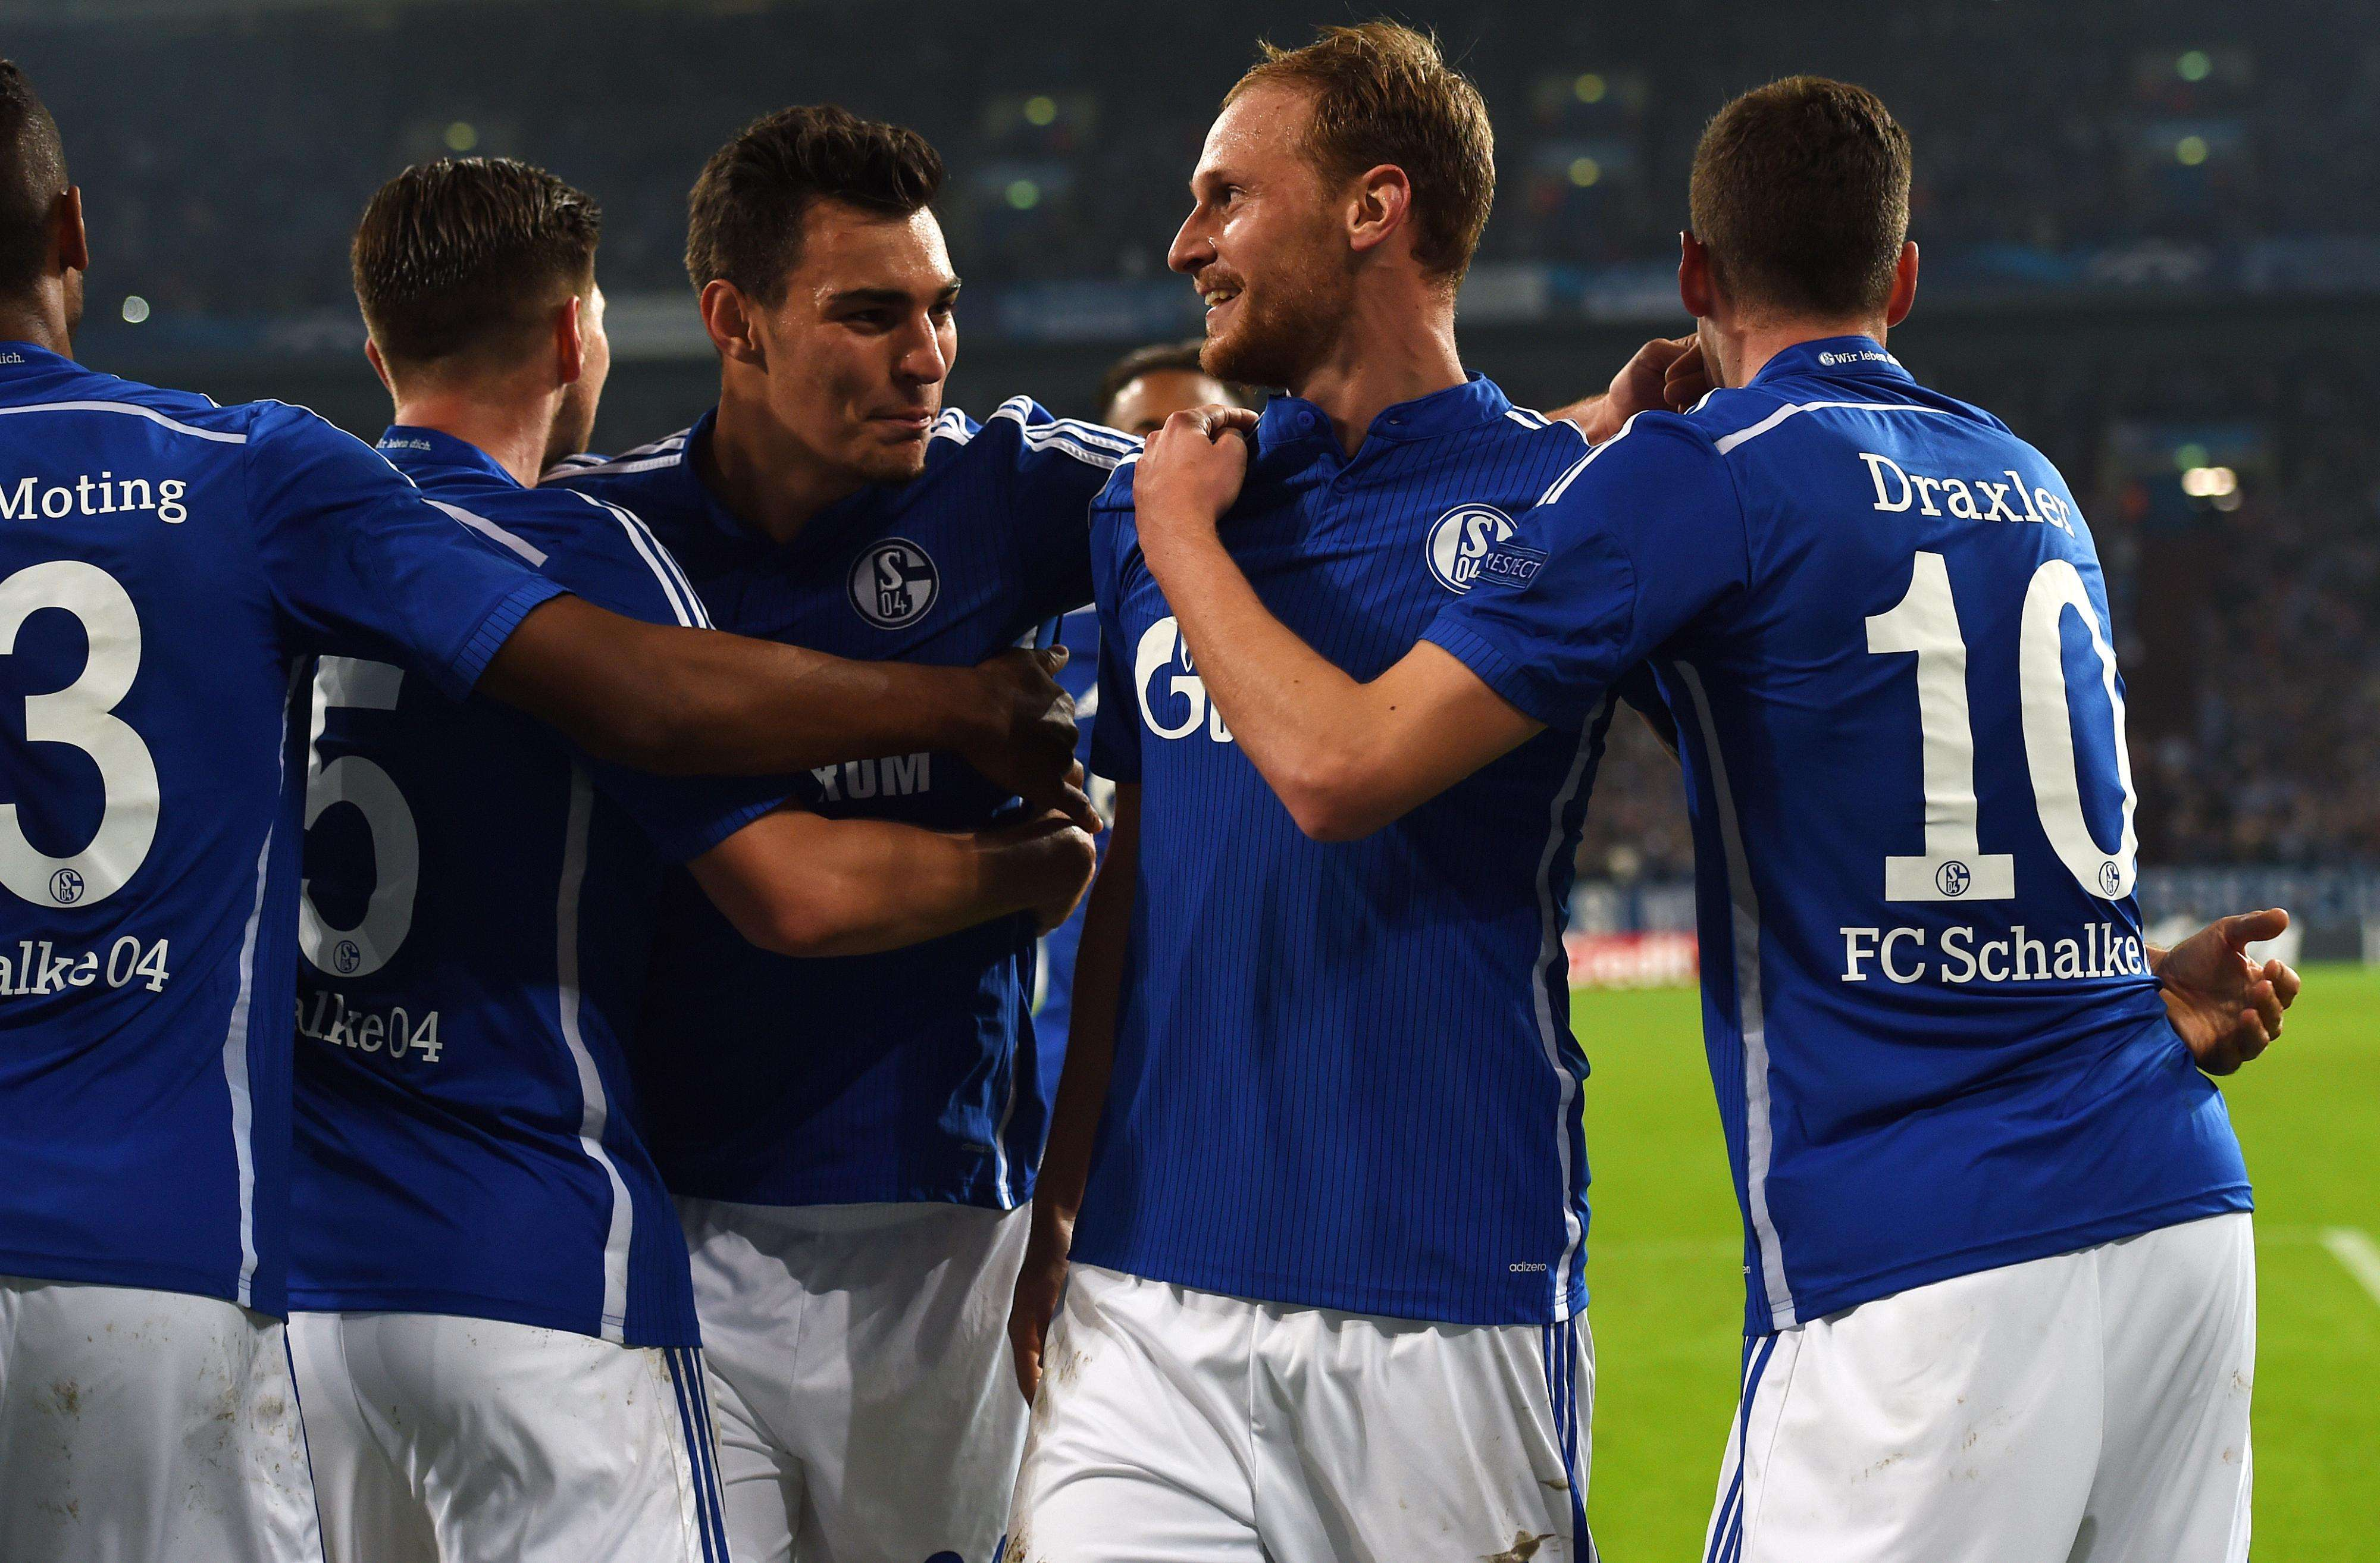 Zagueiro Hoewedes também deixou o dele a favor do Schalke Foto: Patrik Stollarz/AFP